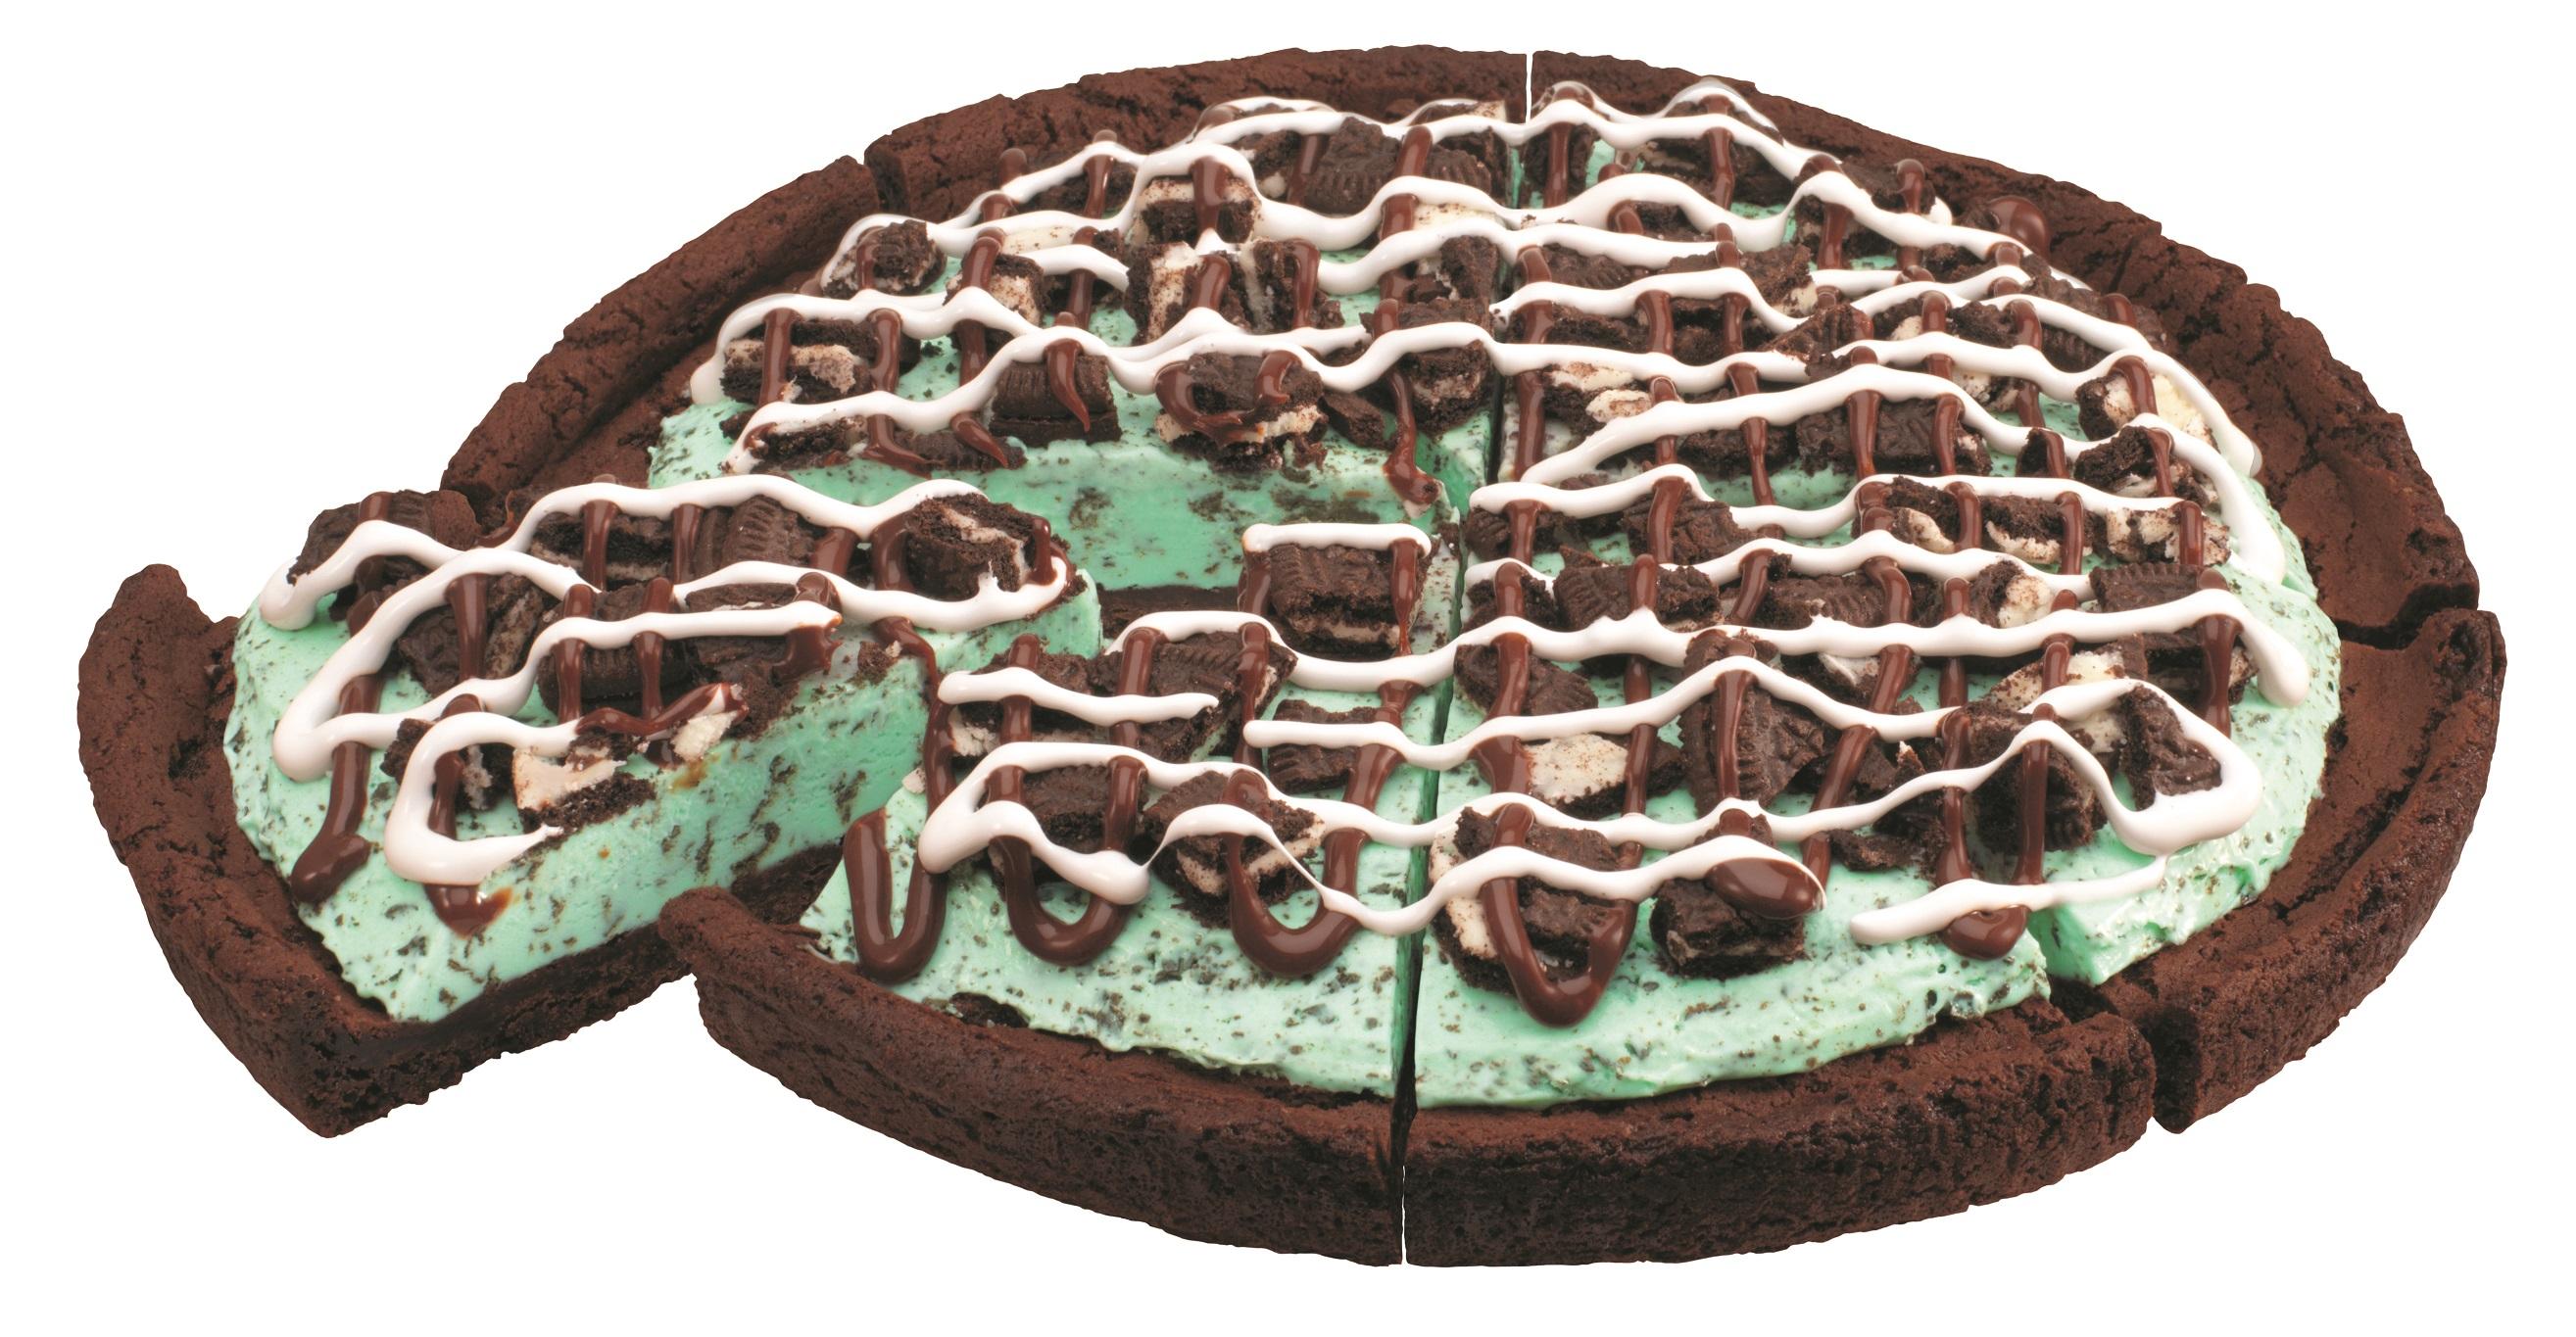 Oreo Mint Chocolate Chip Ice Cream Cake